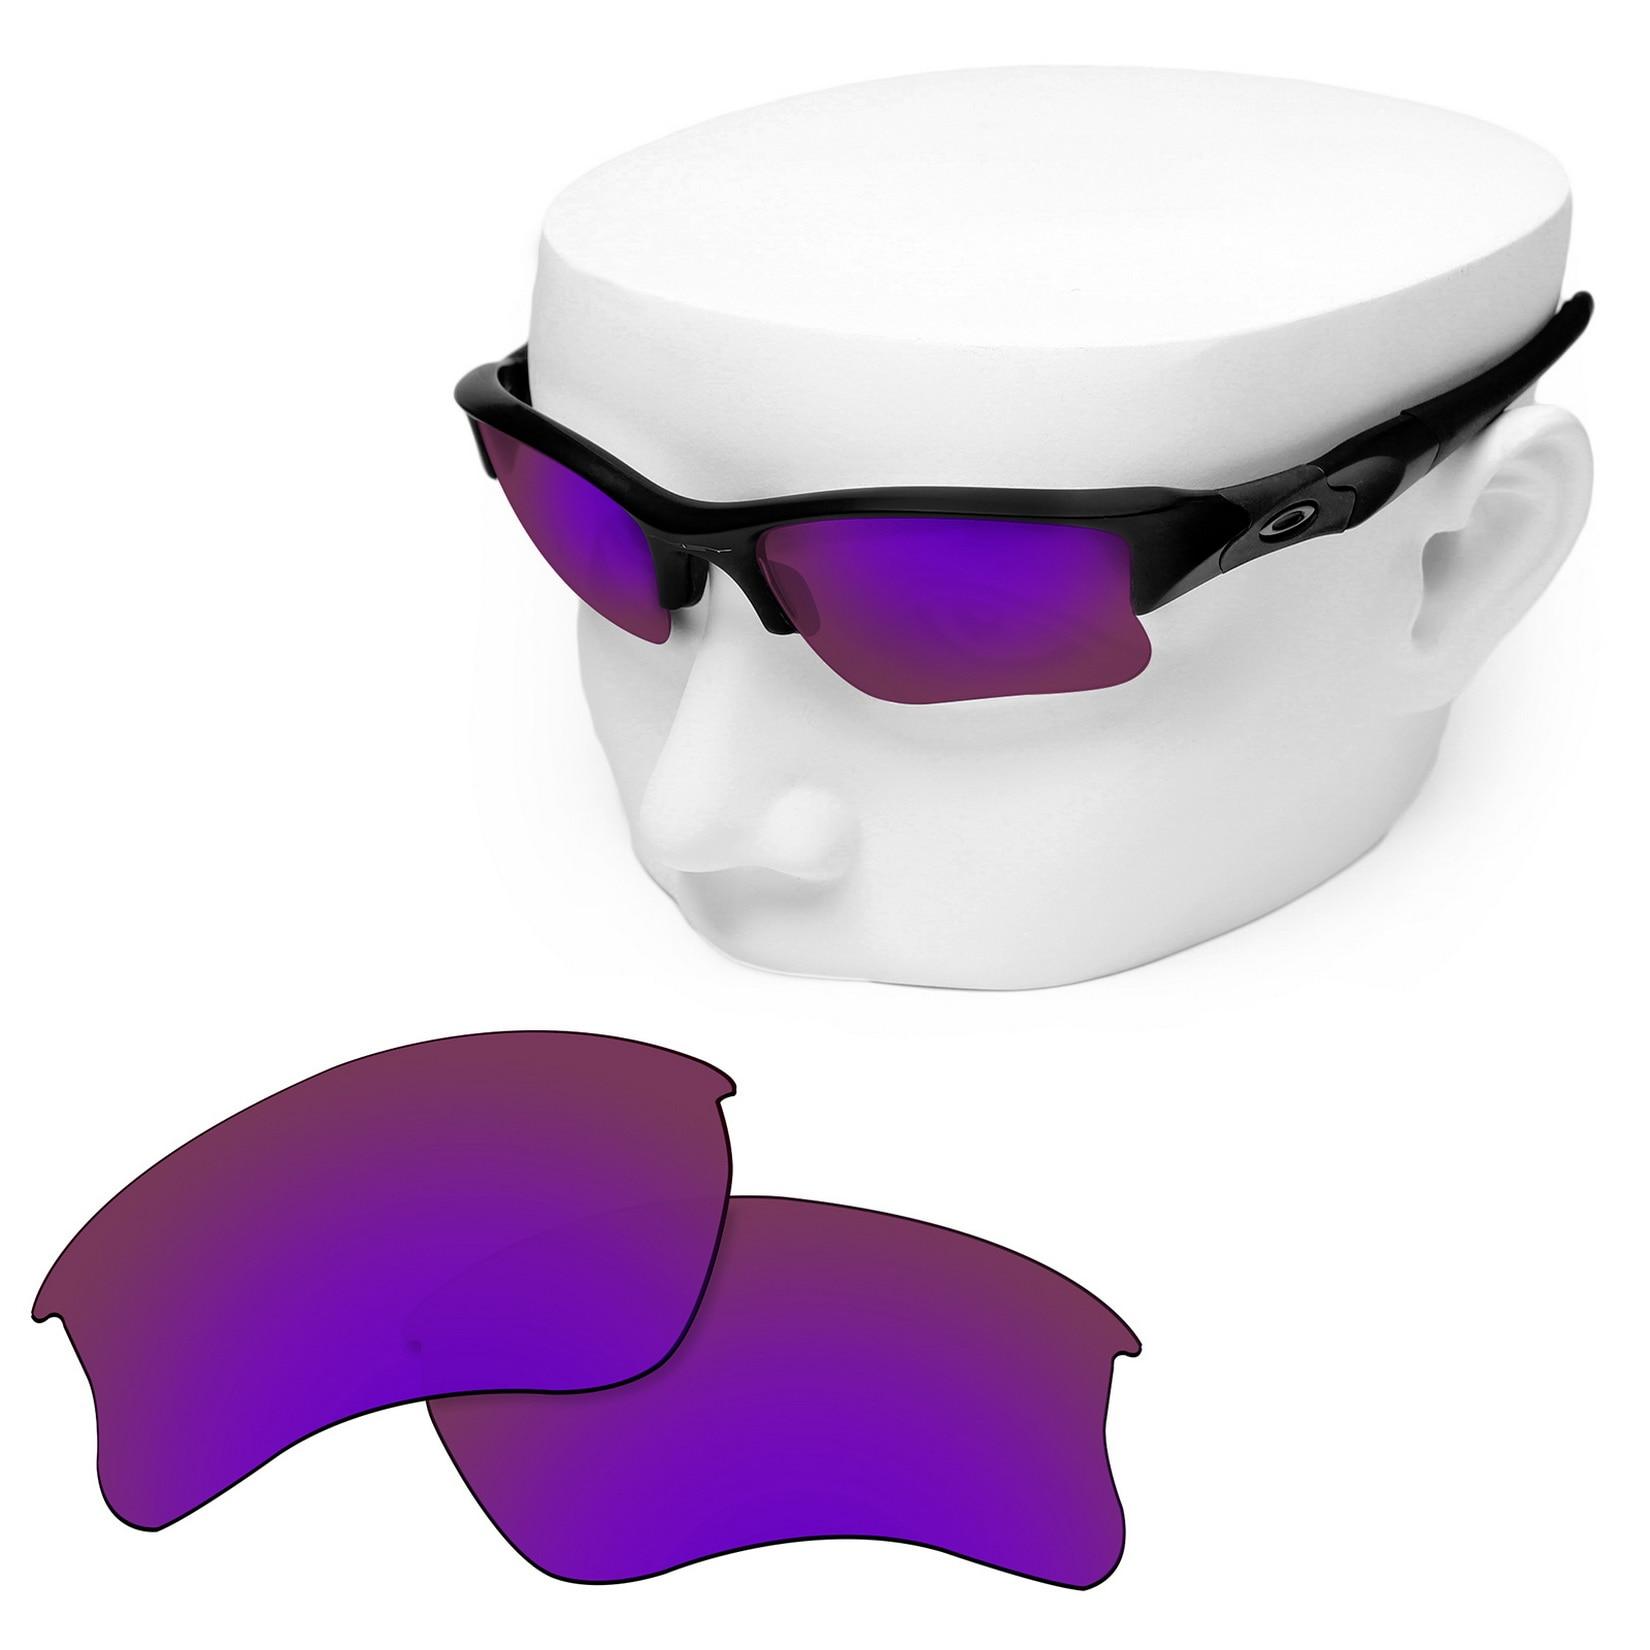 OOWLIT lentes polarizadas de repuesto de espejo púrpura para-gafas de sol XLJ